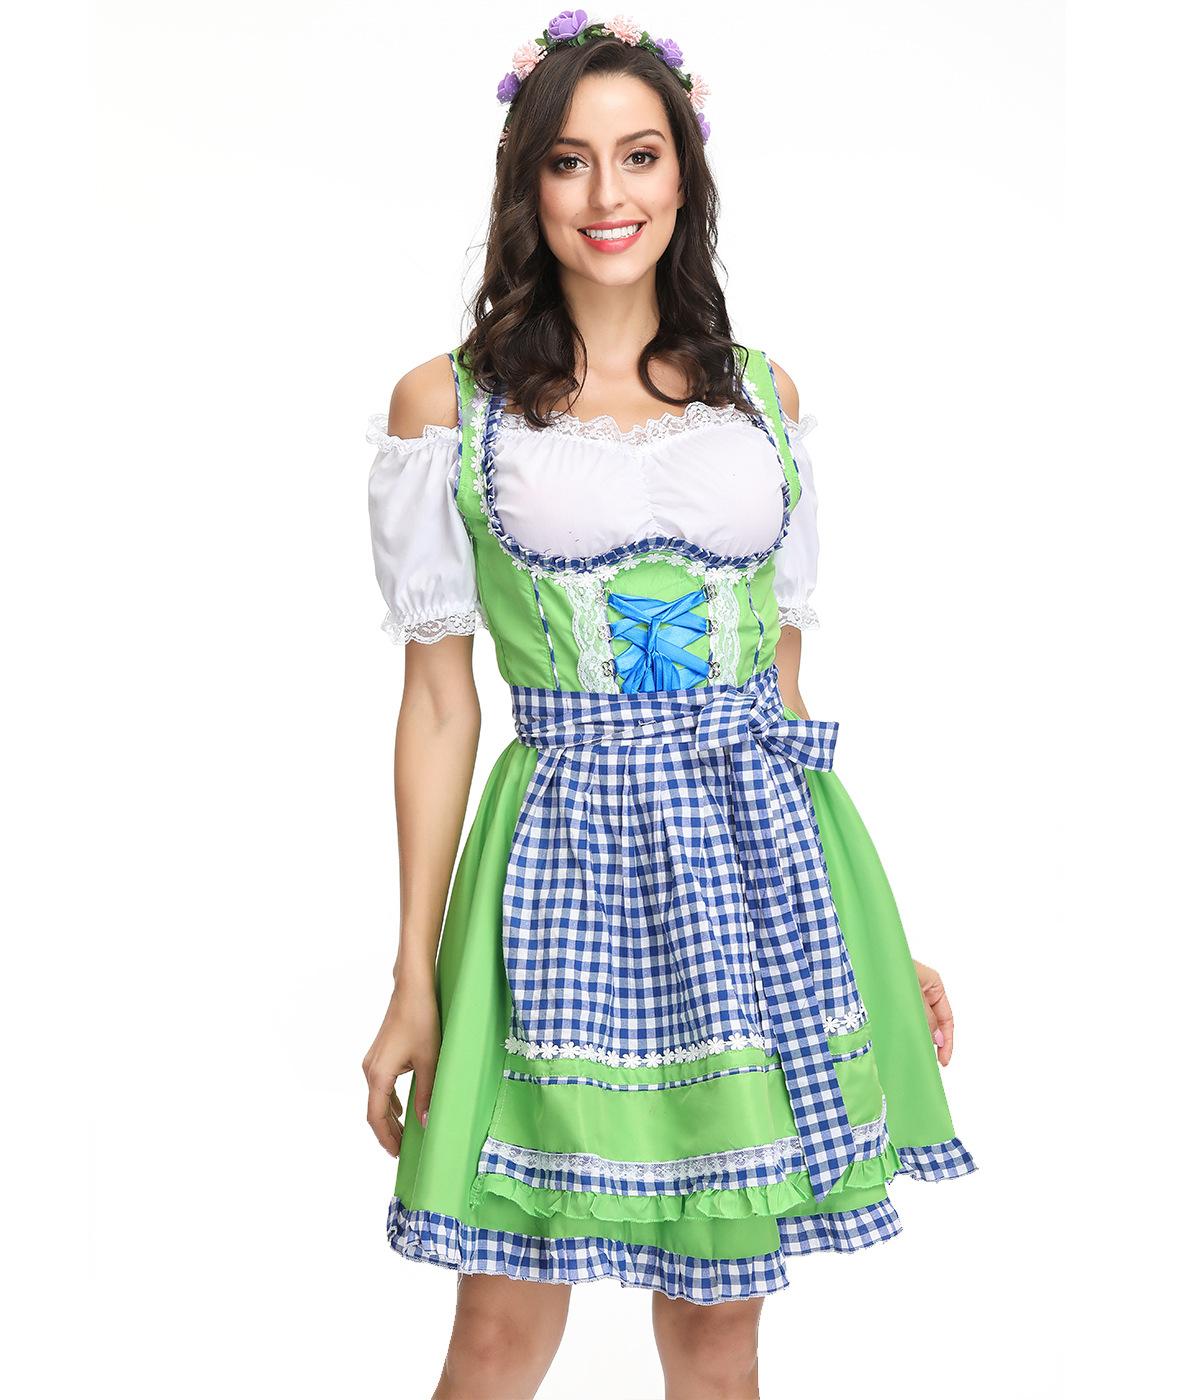 Women Oktoberfest Dirndl Off-shoulder Maid Cosplay Dress Costume Beer Festival Dress green_M